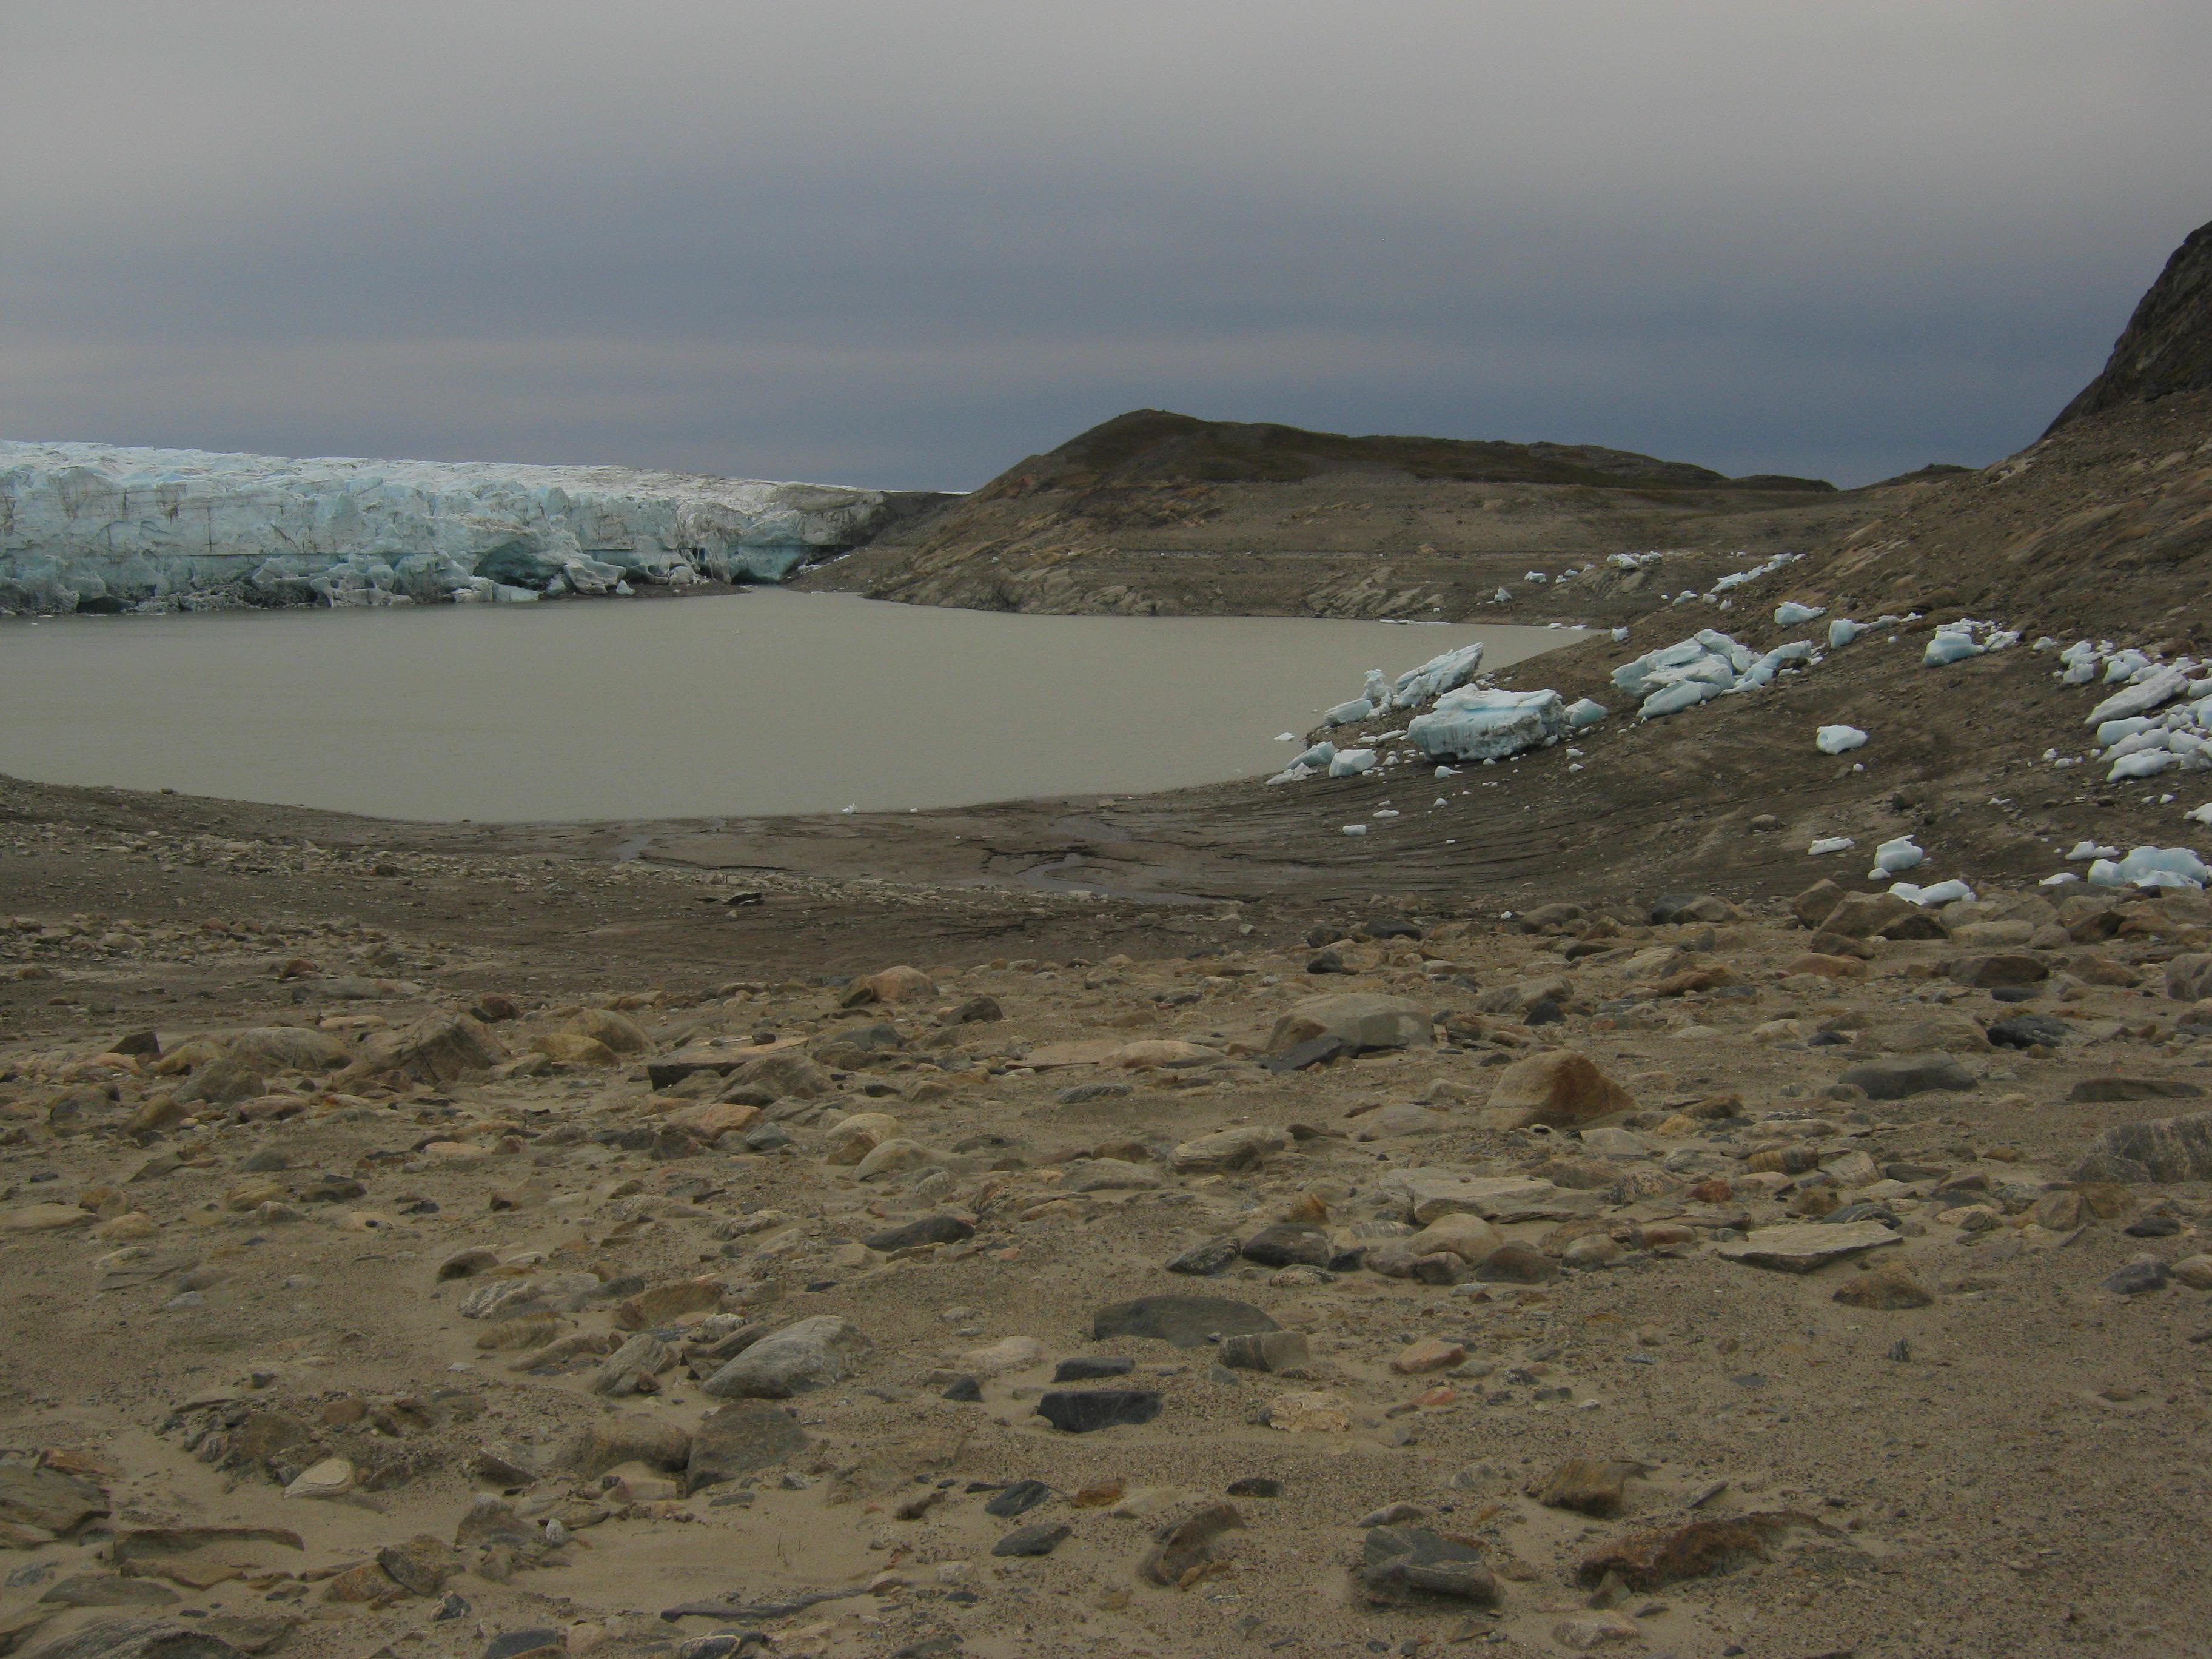 Ice Dam Break in Kangerlussuaq | Dartmouth IGERT - Polar